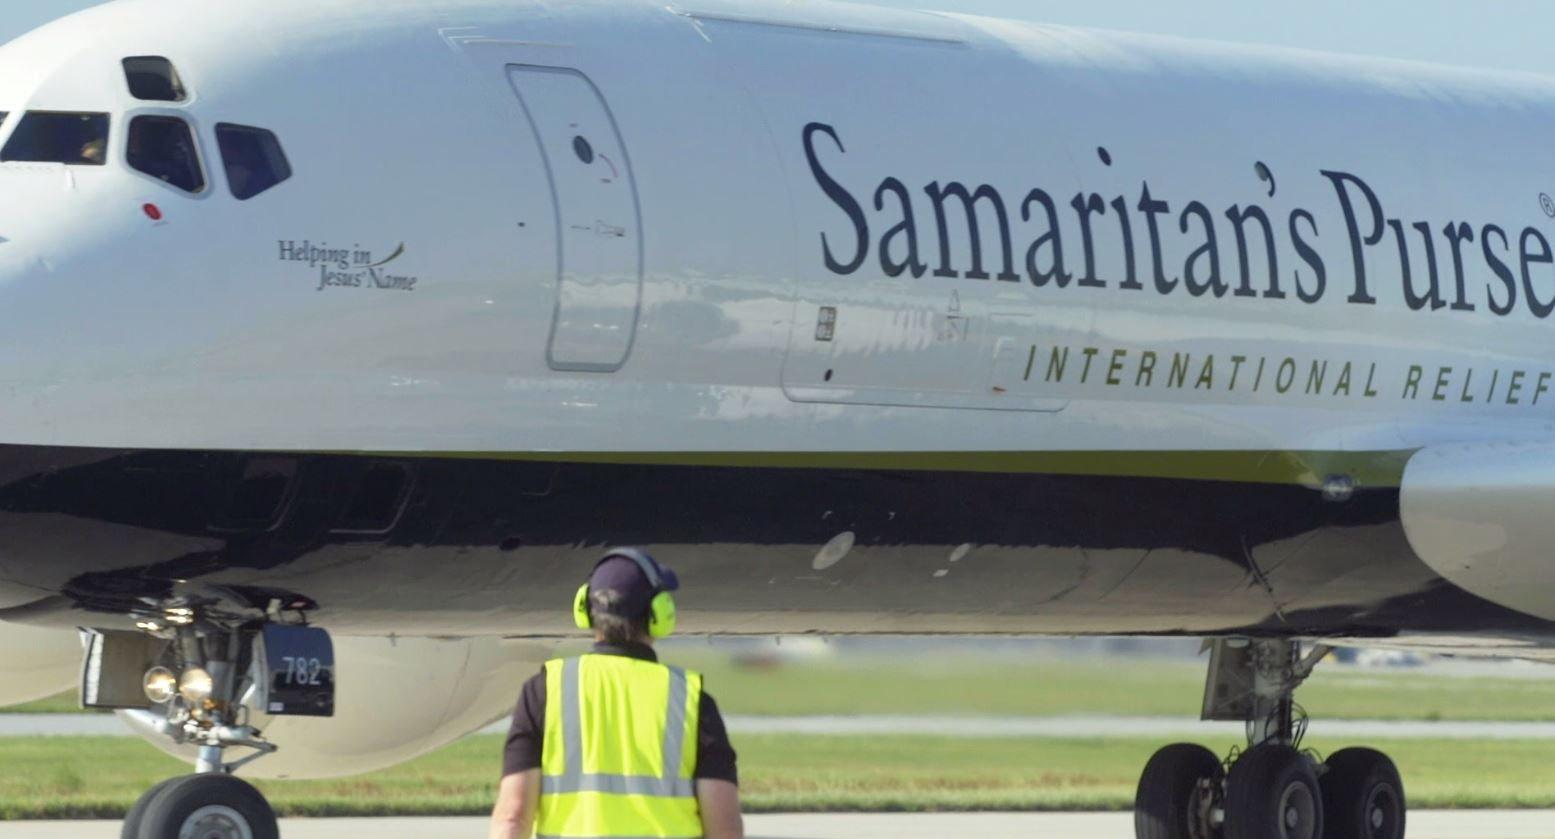 Samaritan's Purse cargo plane (Provided)